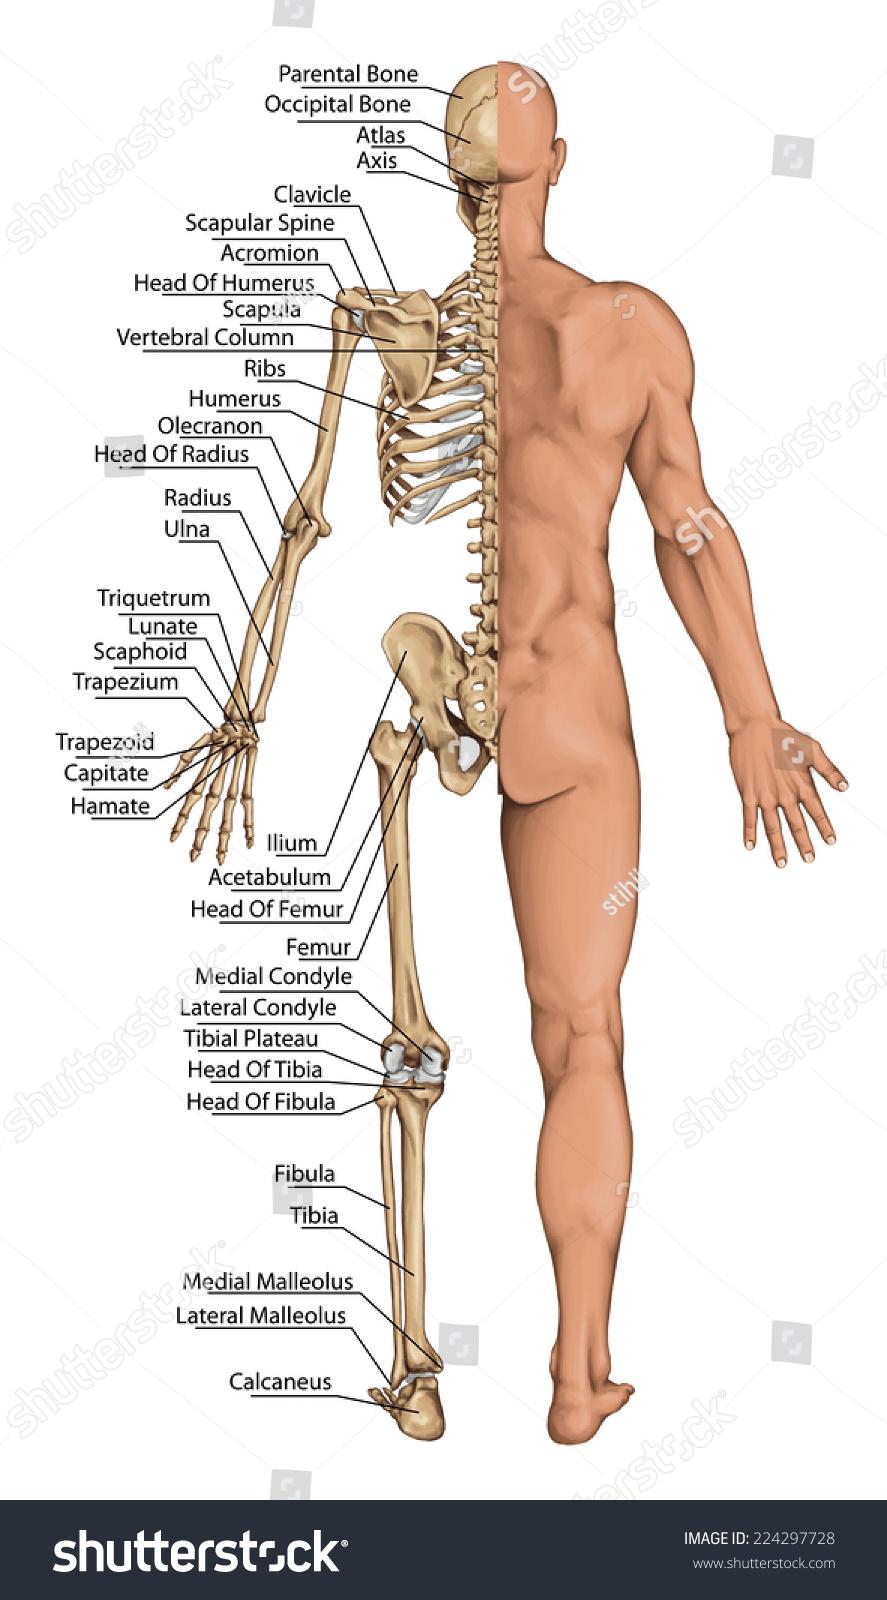 Anatomical Board Anatomical Body Human Skeleton Stock Illustration ...